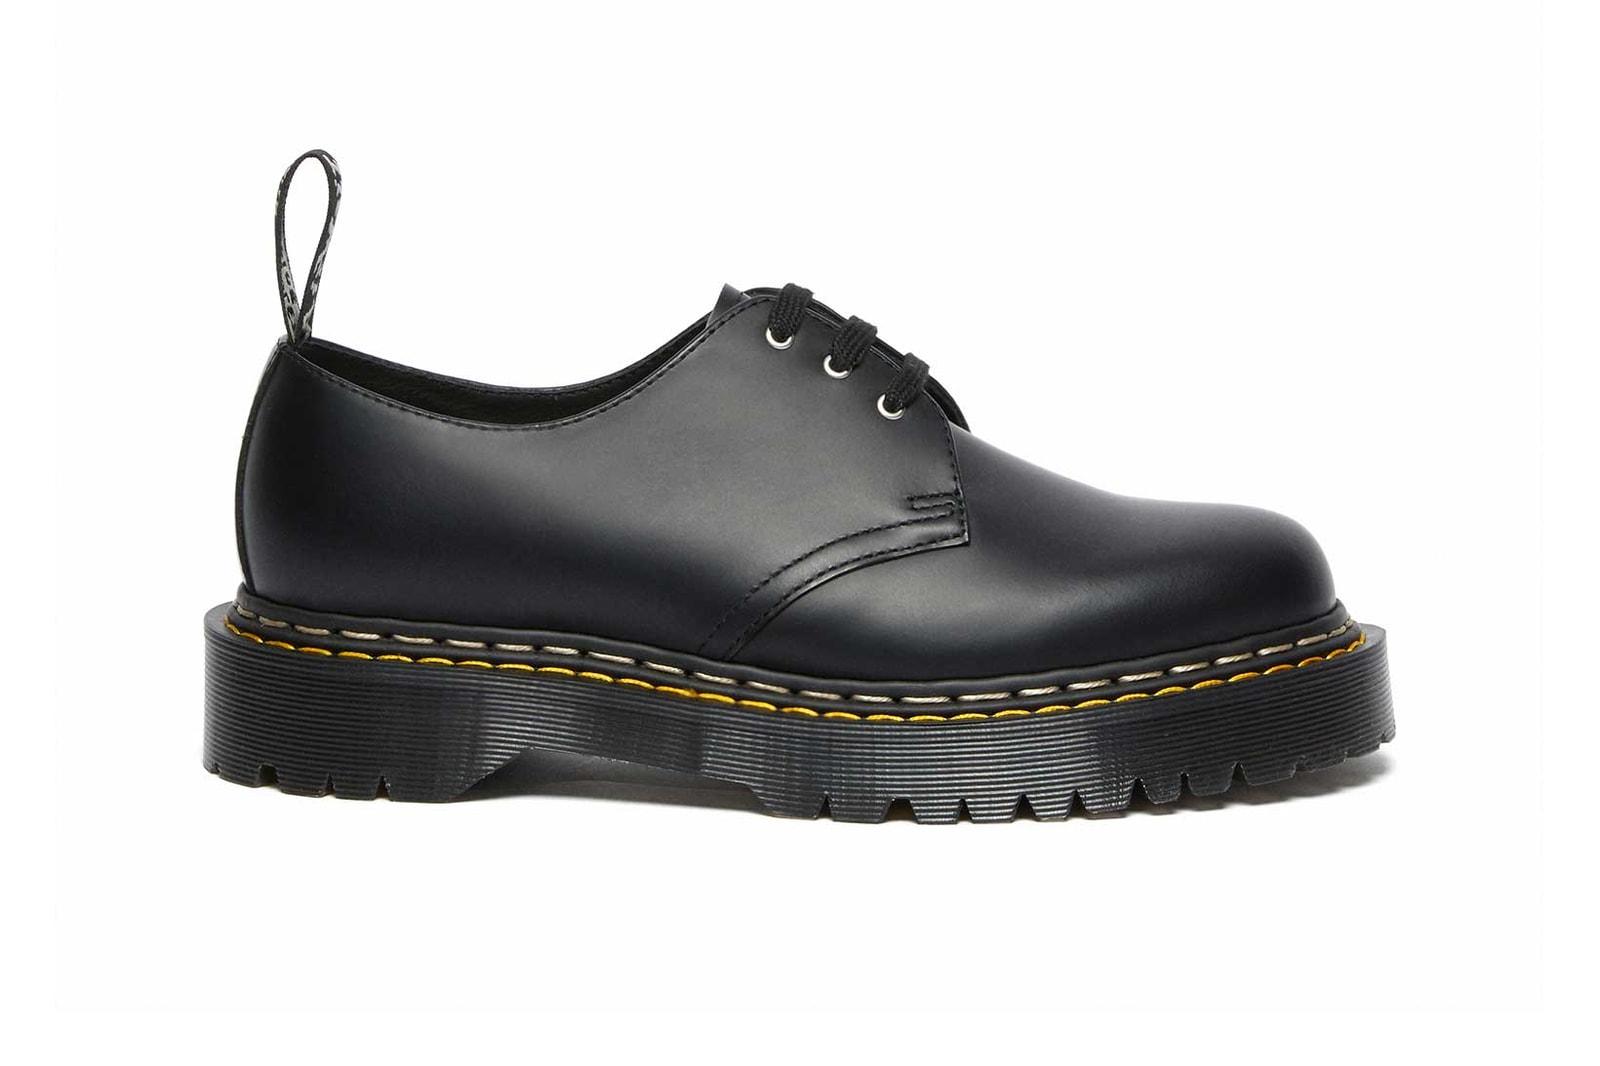 dr martens rick owens 1460 bex boot gryphon sandal 1461 bex ds collaboration footwear